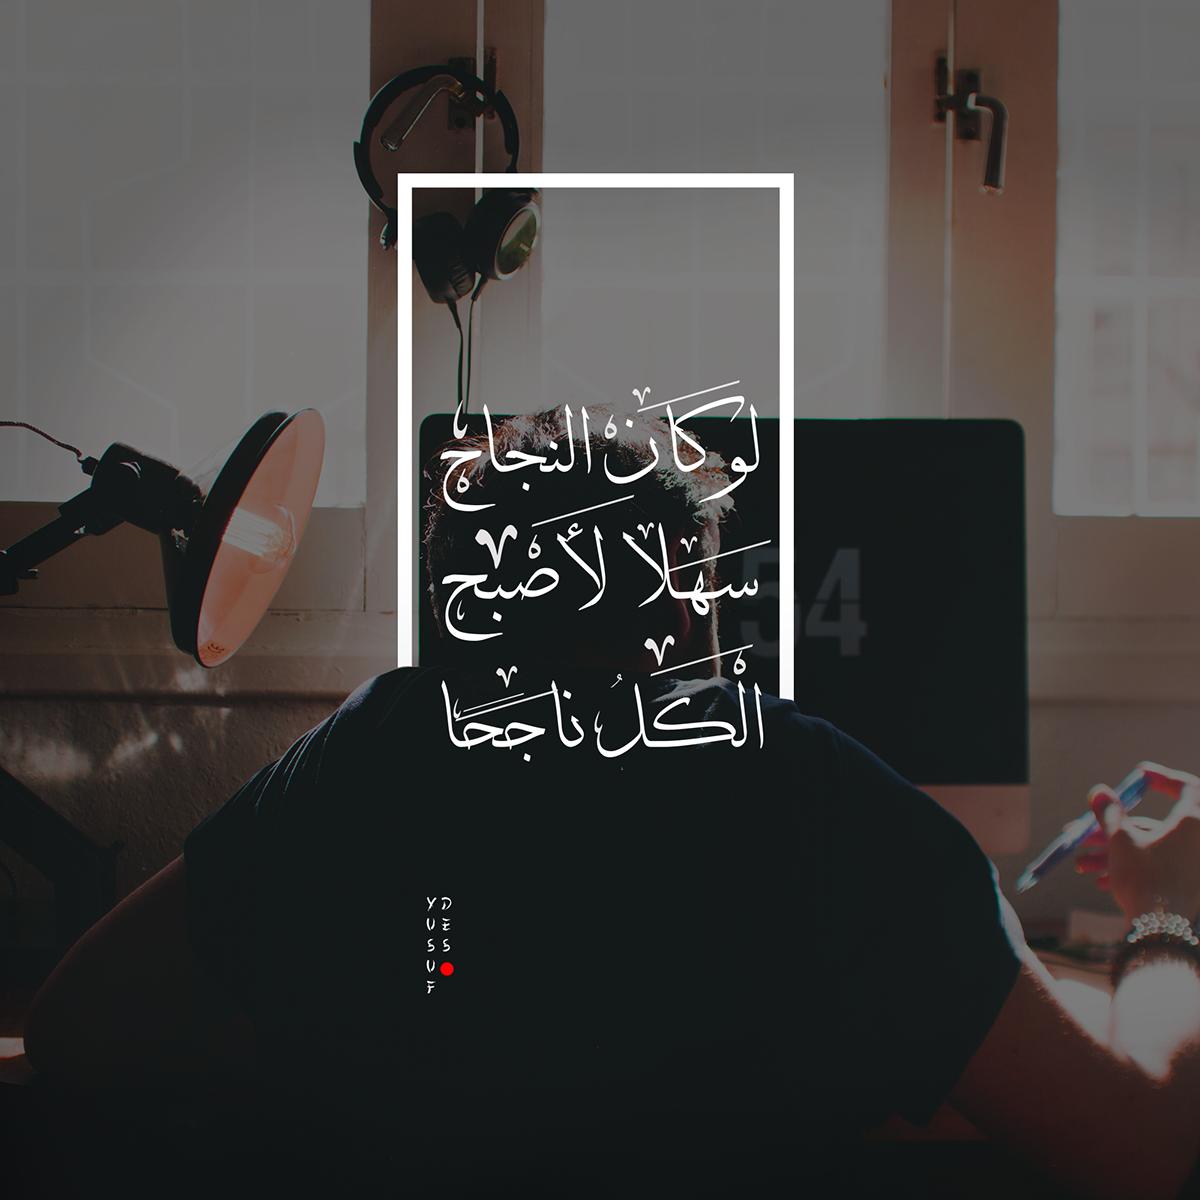 عبارات م لهمة متجدد On Behance Quotes About New Year Cover Photo Quotes Islamic Inspirational Quotes